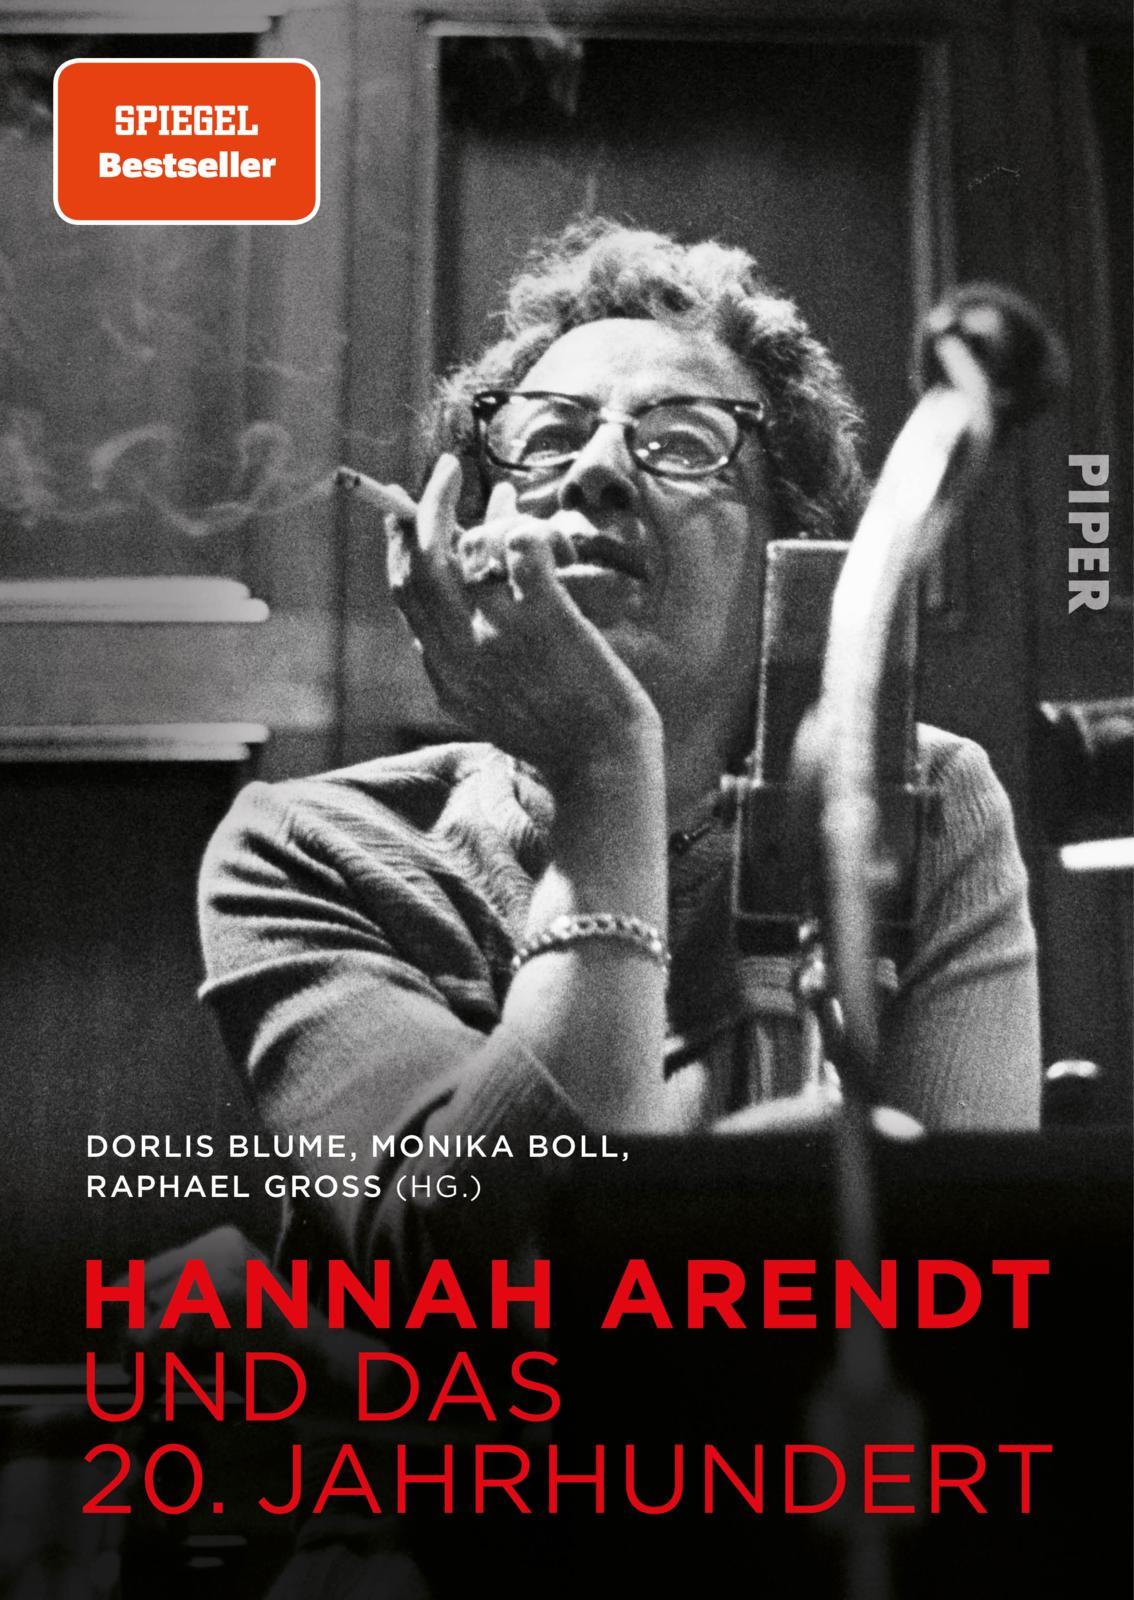 Doris Blume Monika Boll, Raphael Gross Hannah Arendt und das 20. Jahrhundert